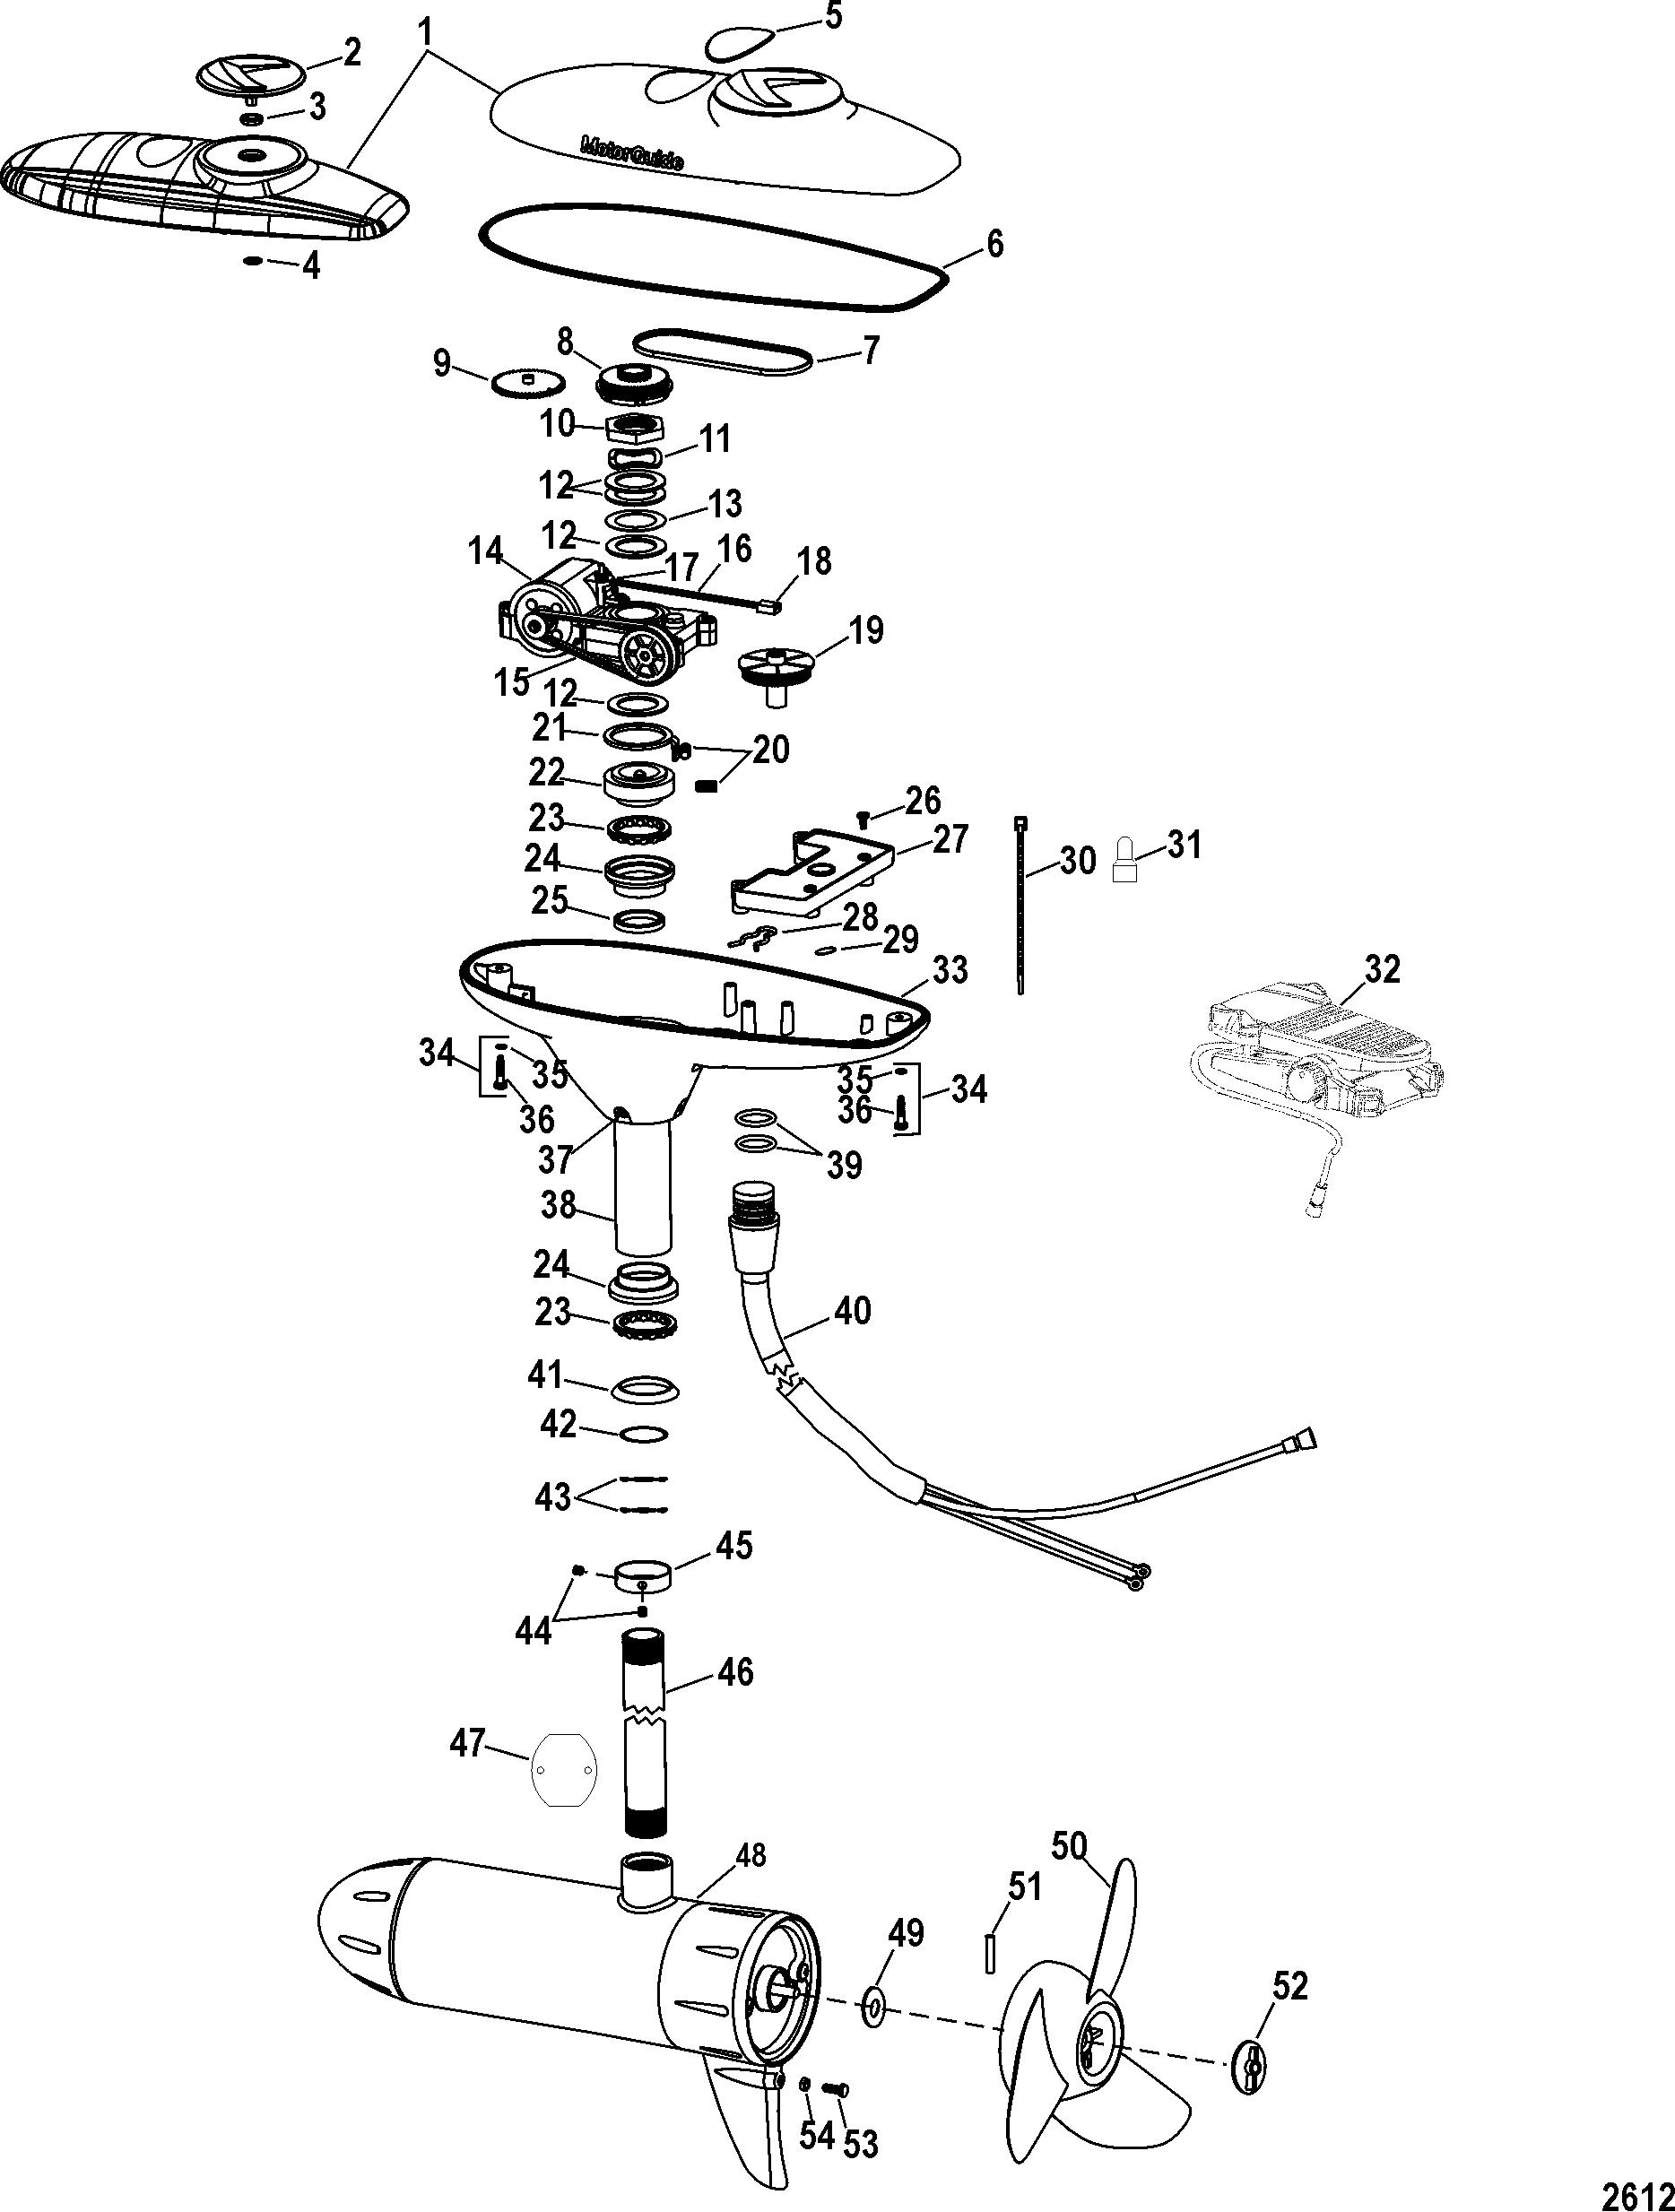 Wireless Trolling Motor Diagram | Wiring Diagram Database